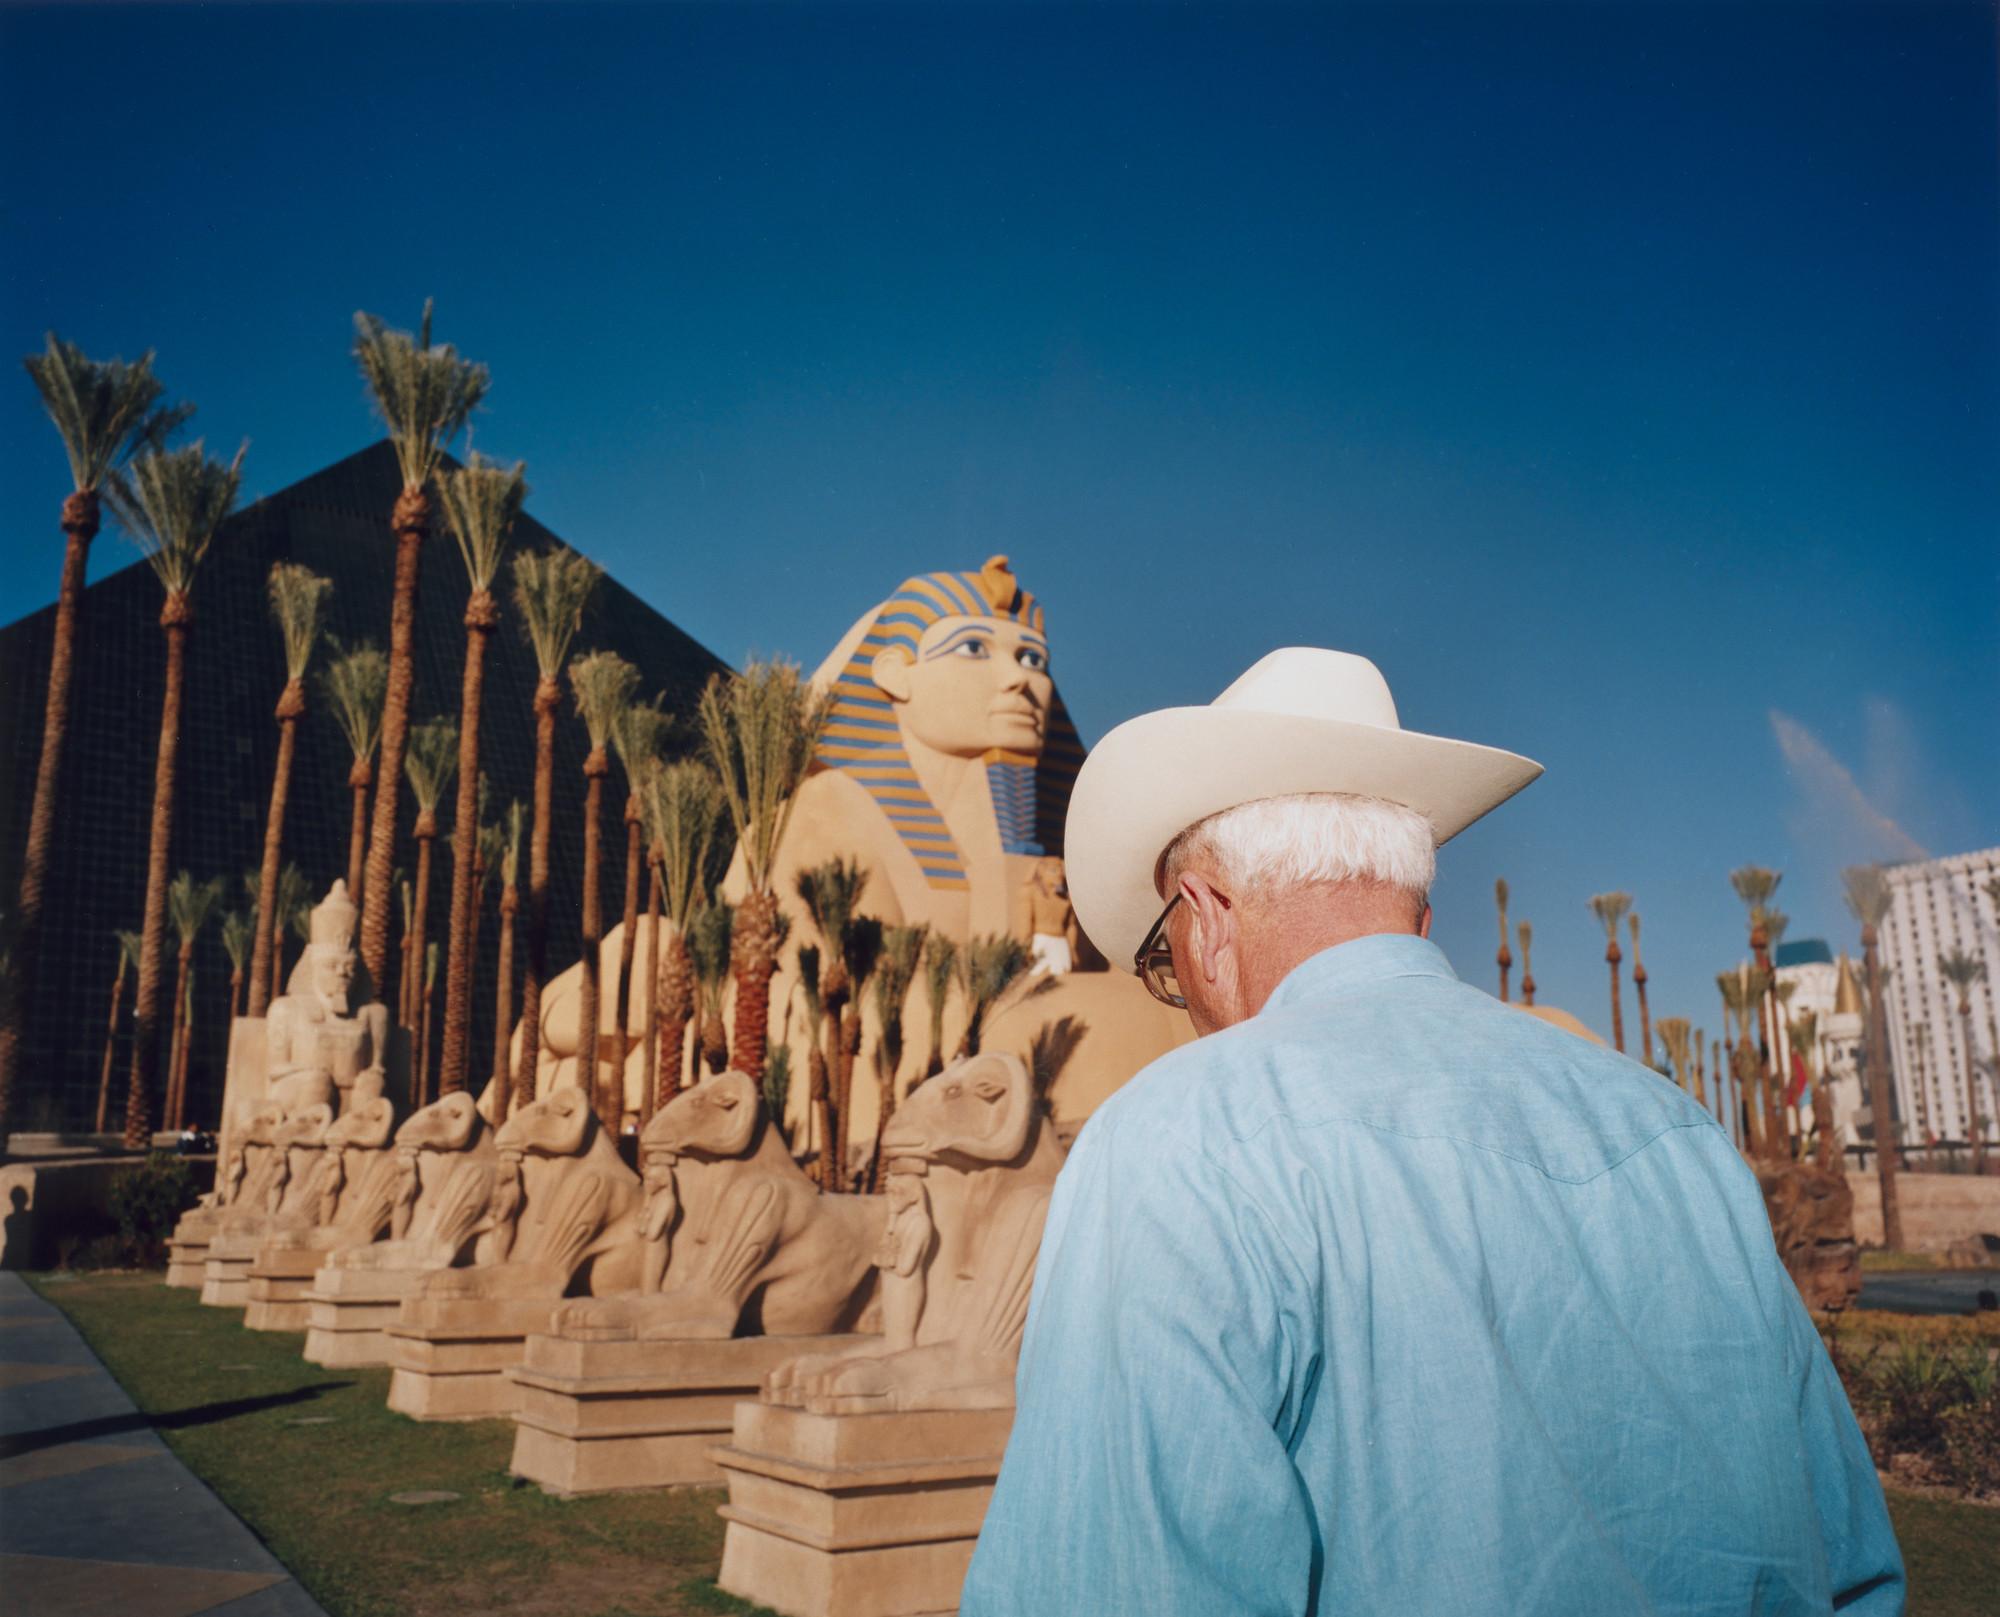 Las Vegas 94 >> Martin Parr The Luxor Hotel And Casino Las Vegas 1994 Moma